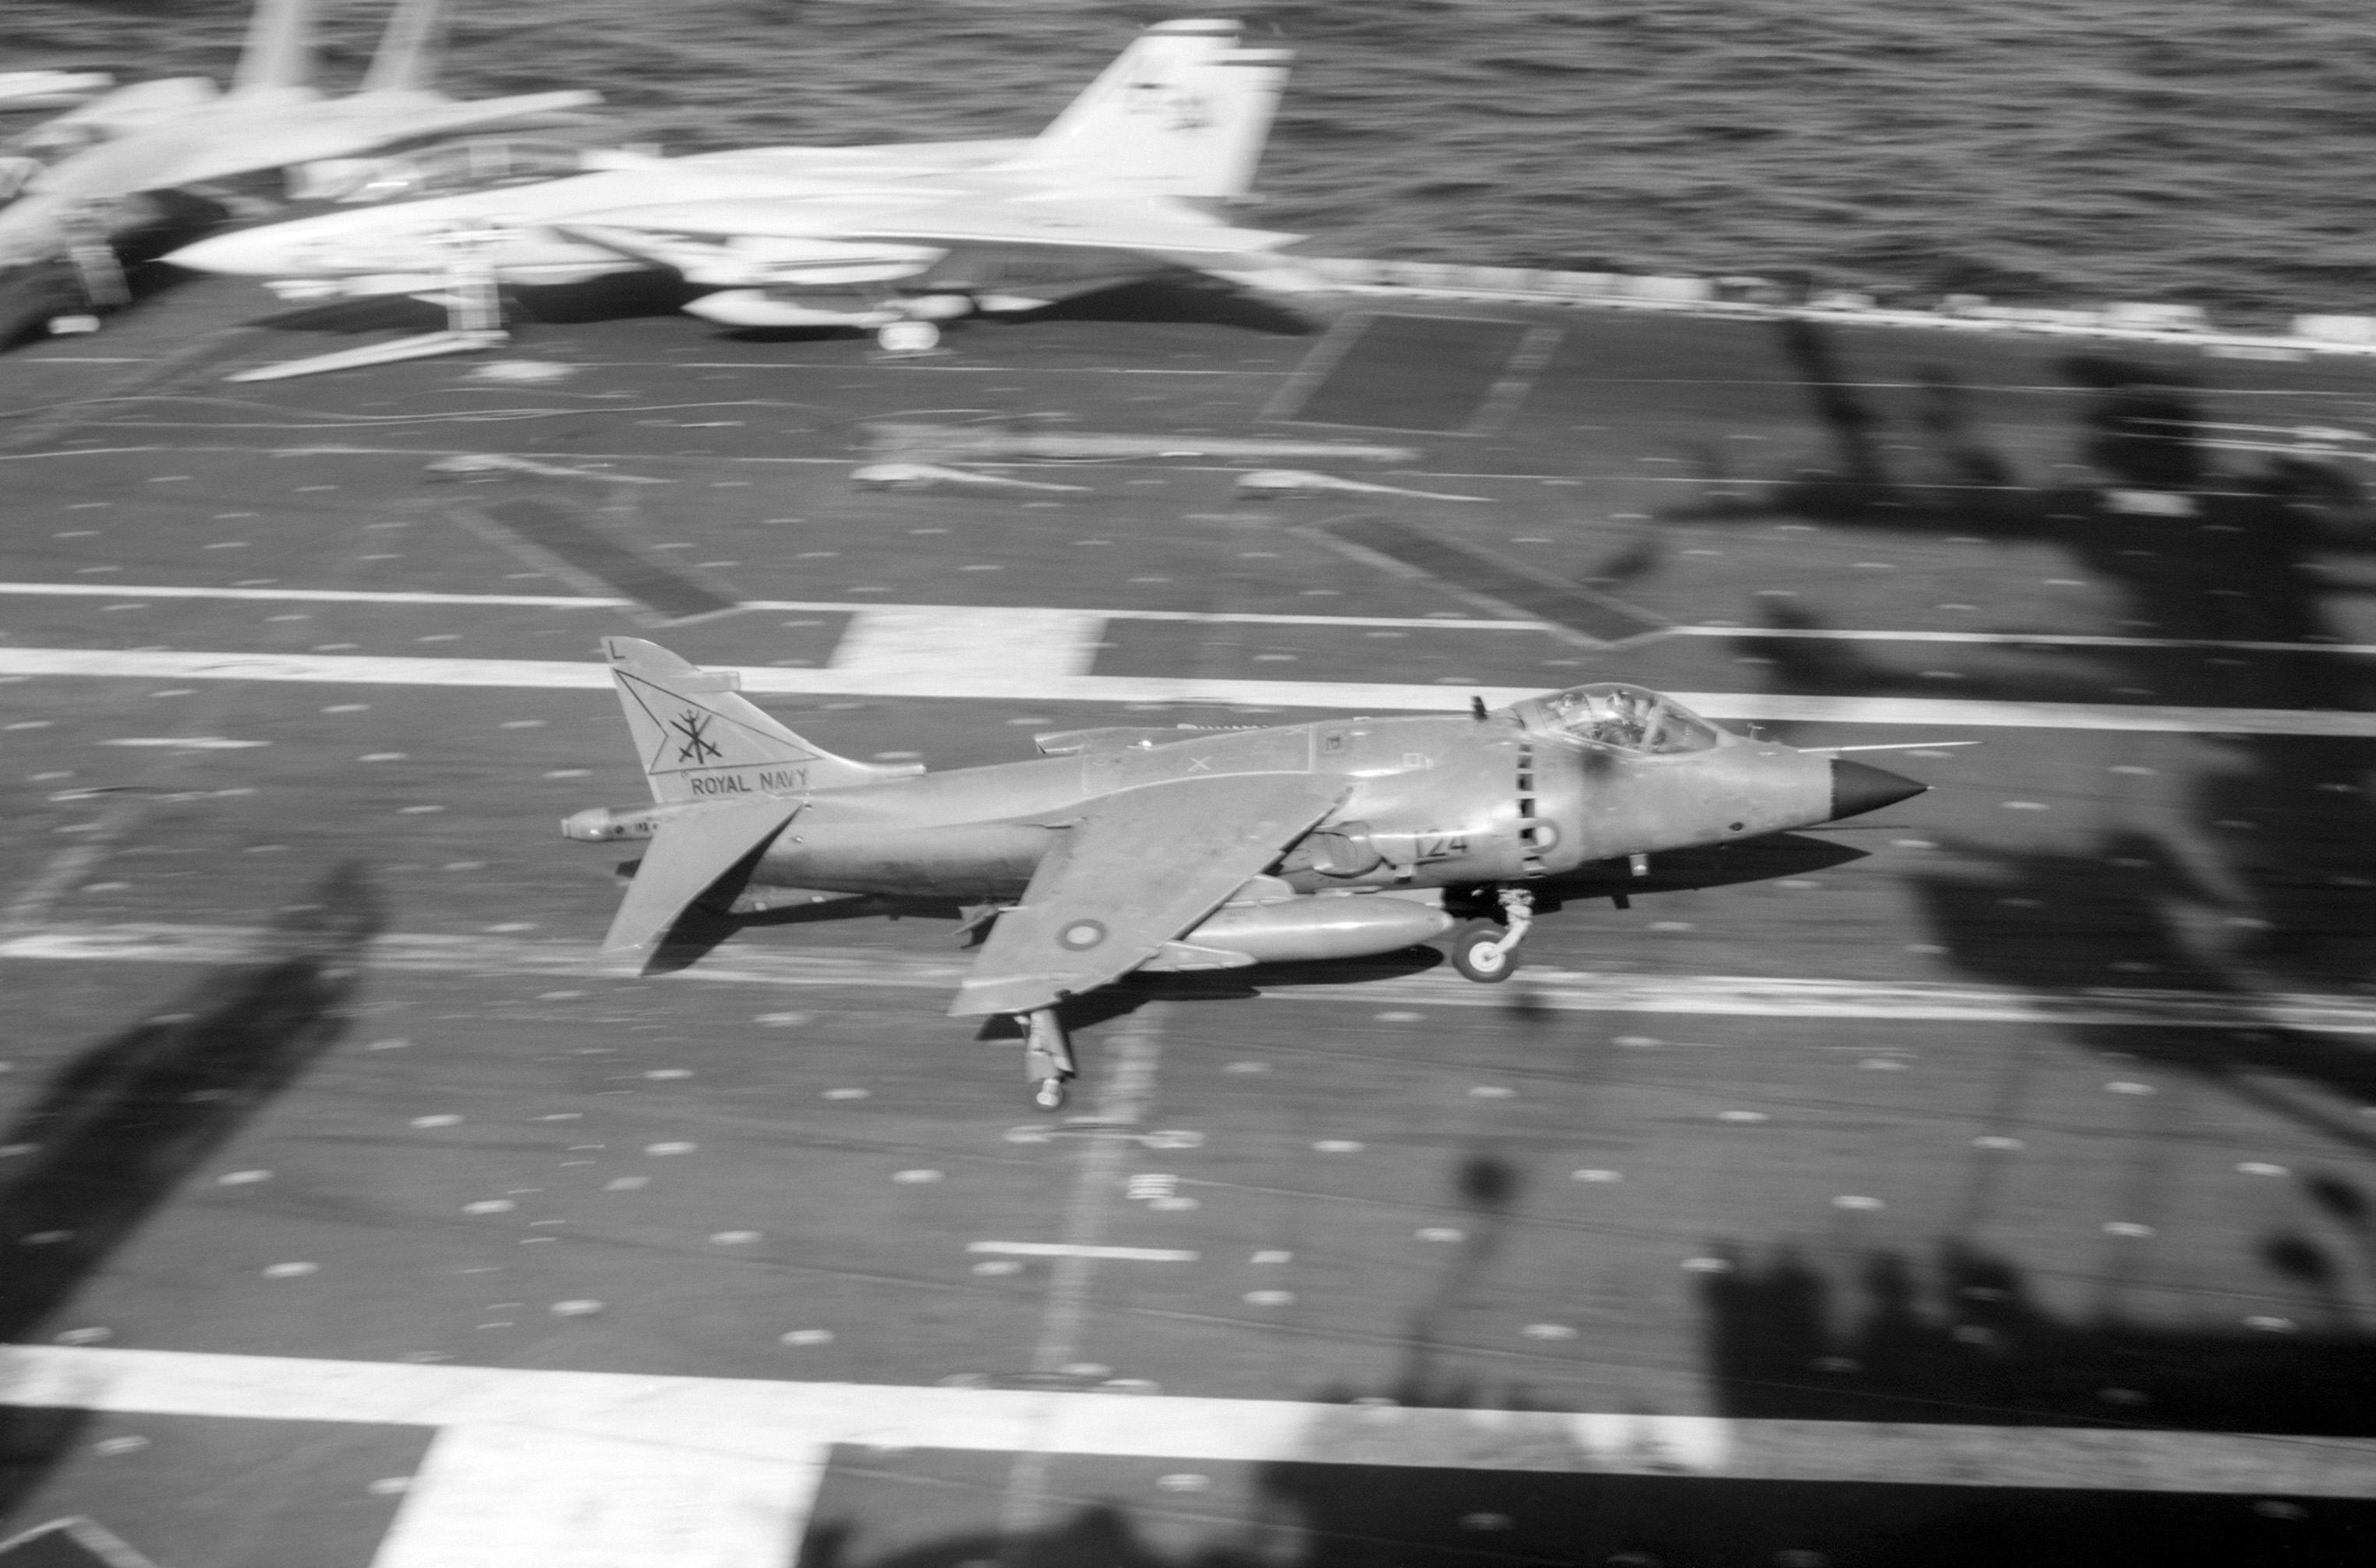 Sea_Harrier_FRS_Mk1_DN-SN-87-05757.jpeg